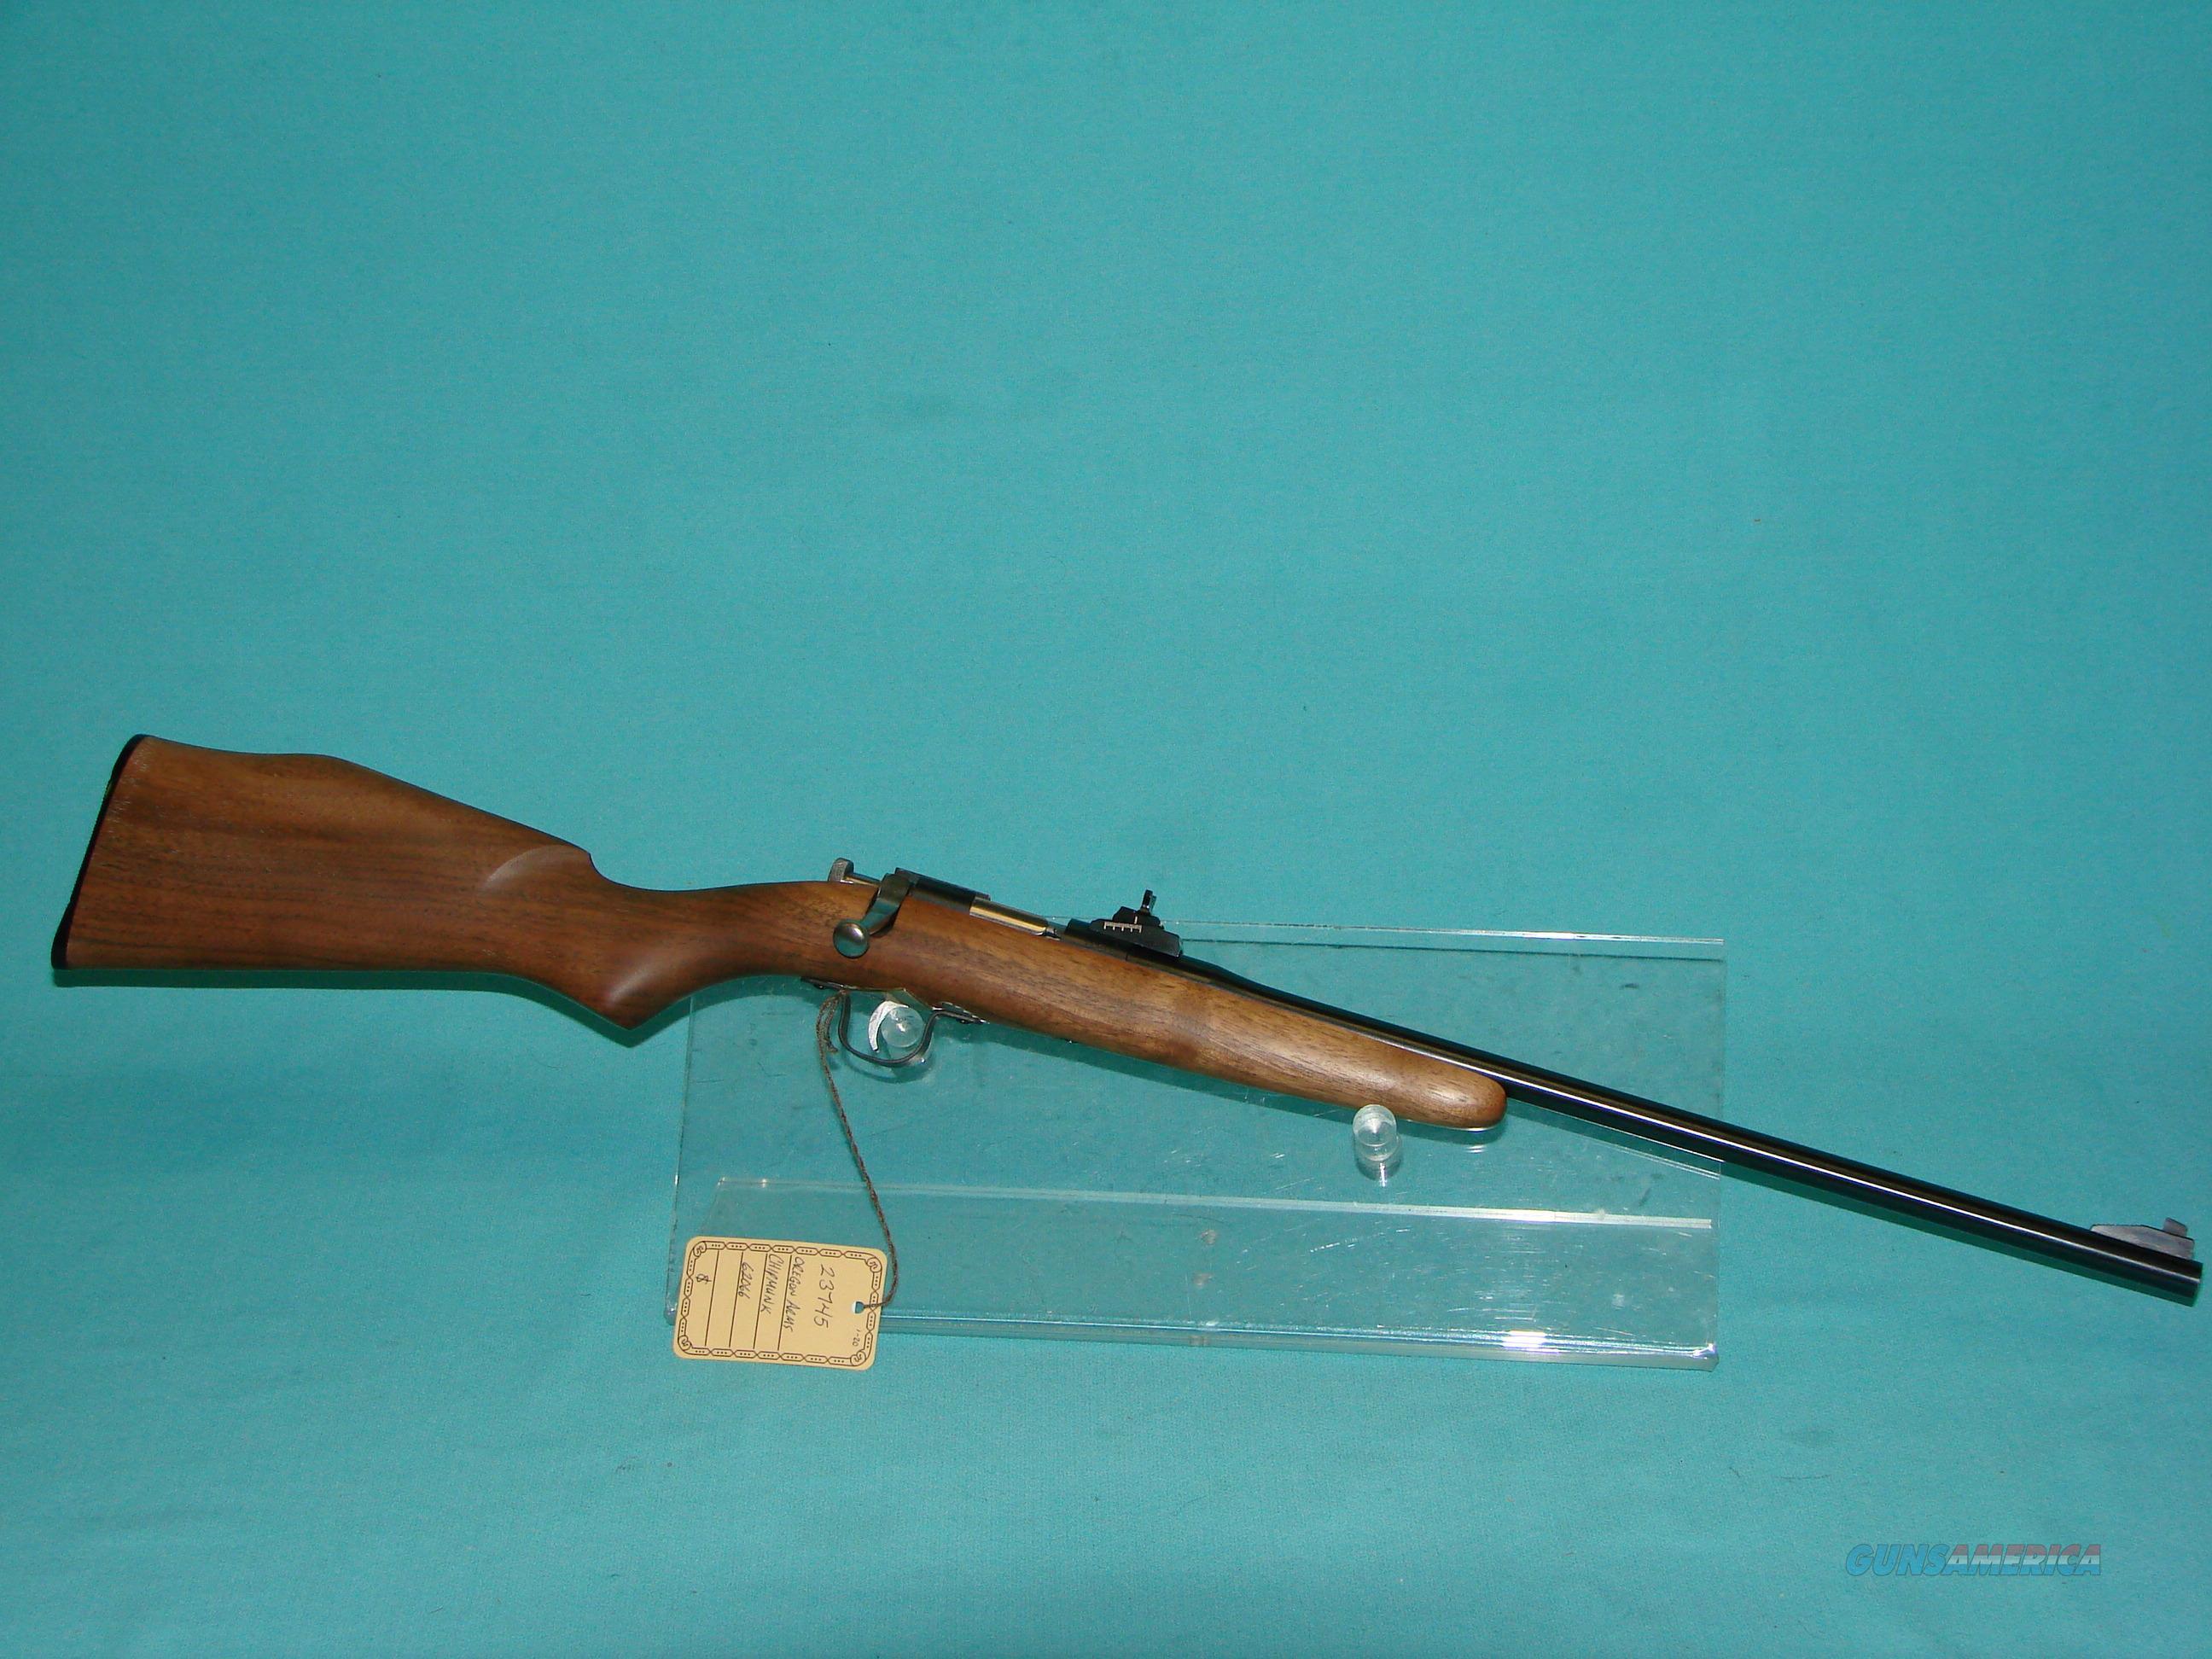 Oregon Arms Chipmunk 22LR